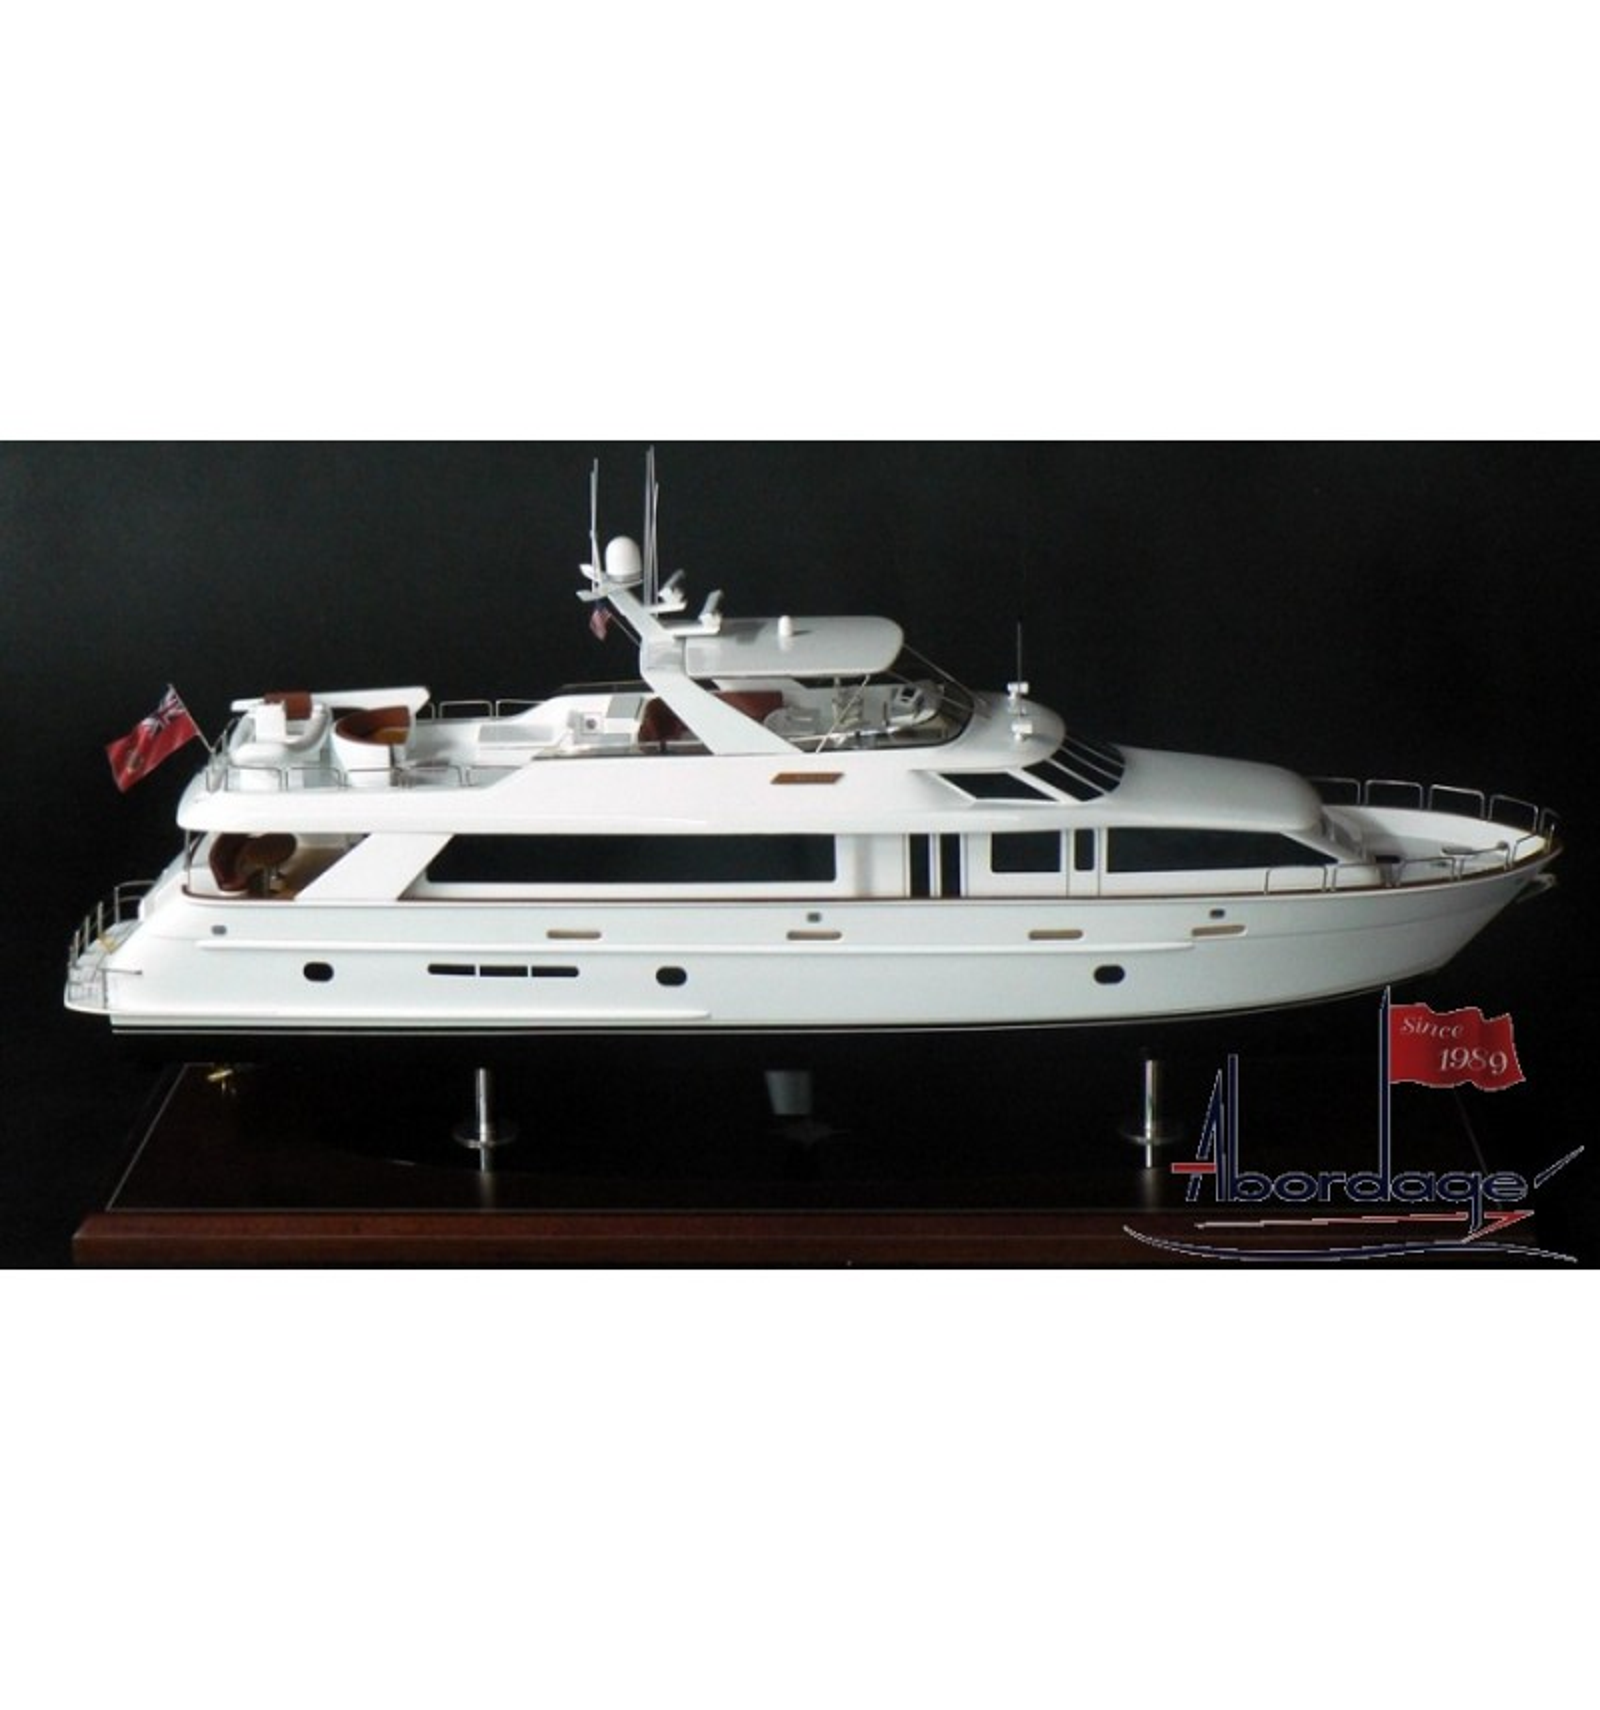 Hatteras 100 Motor Yacht Model